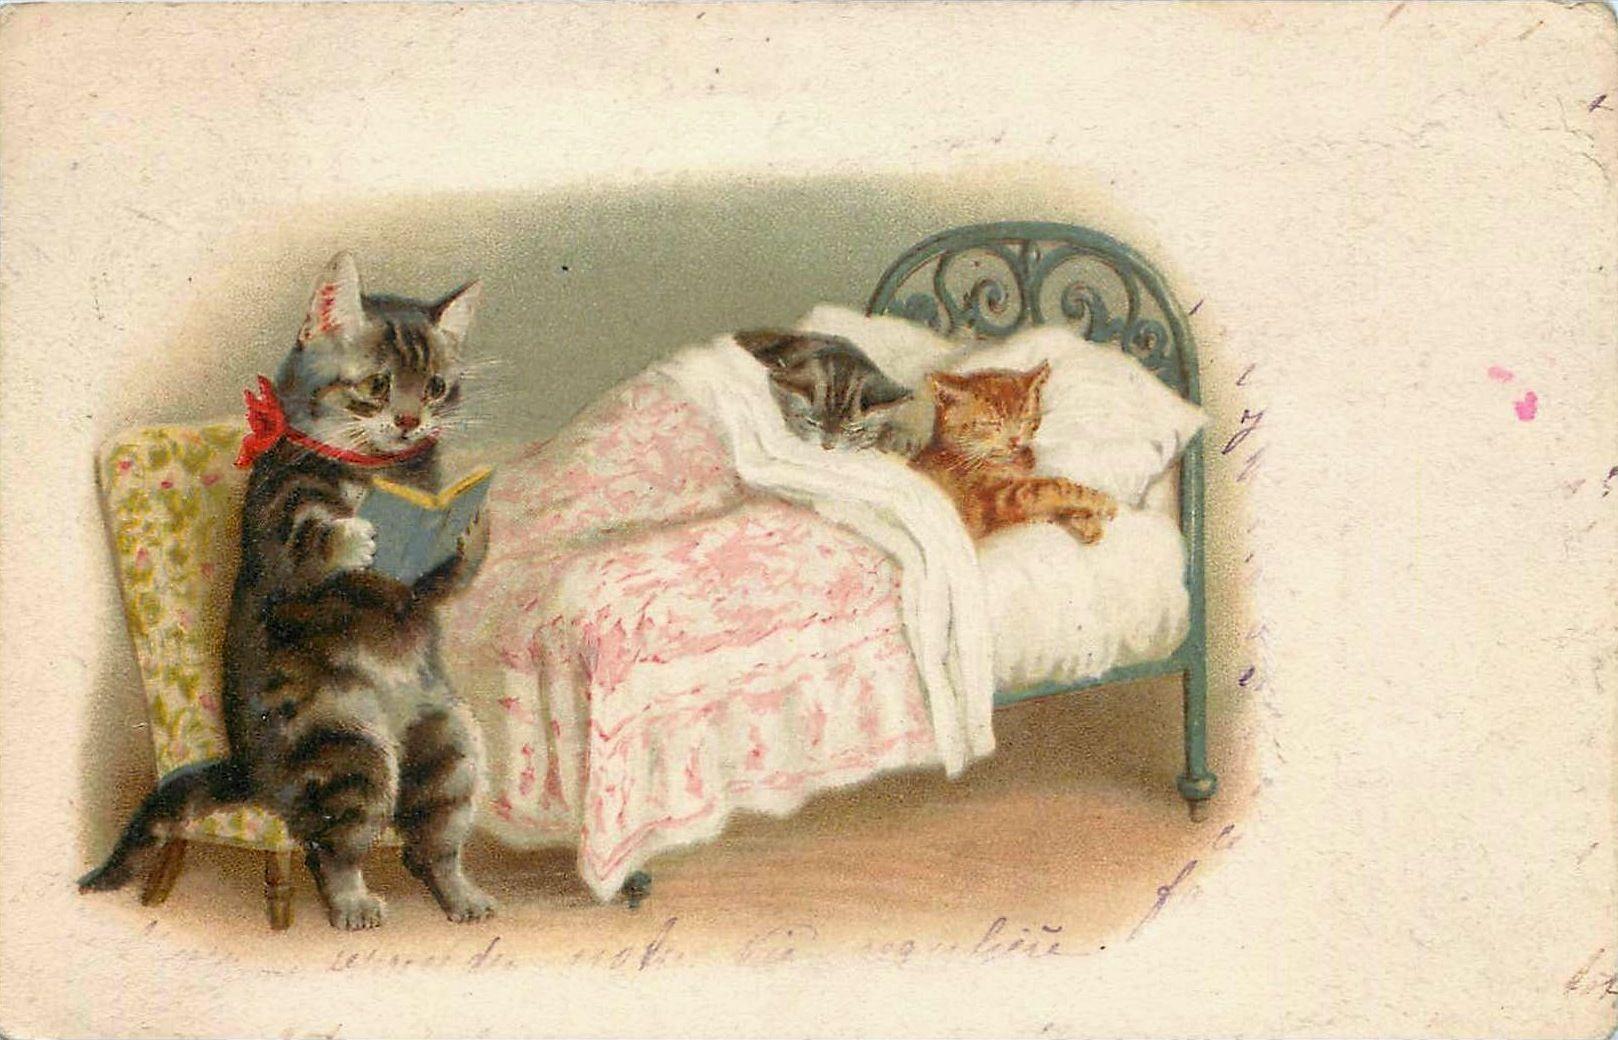 картинки древняя спать горняка